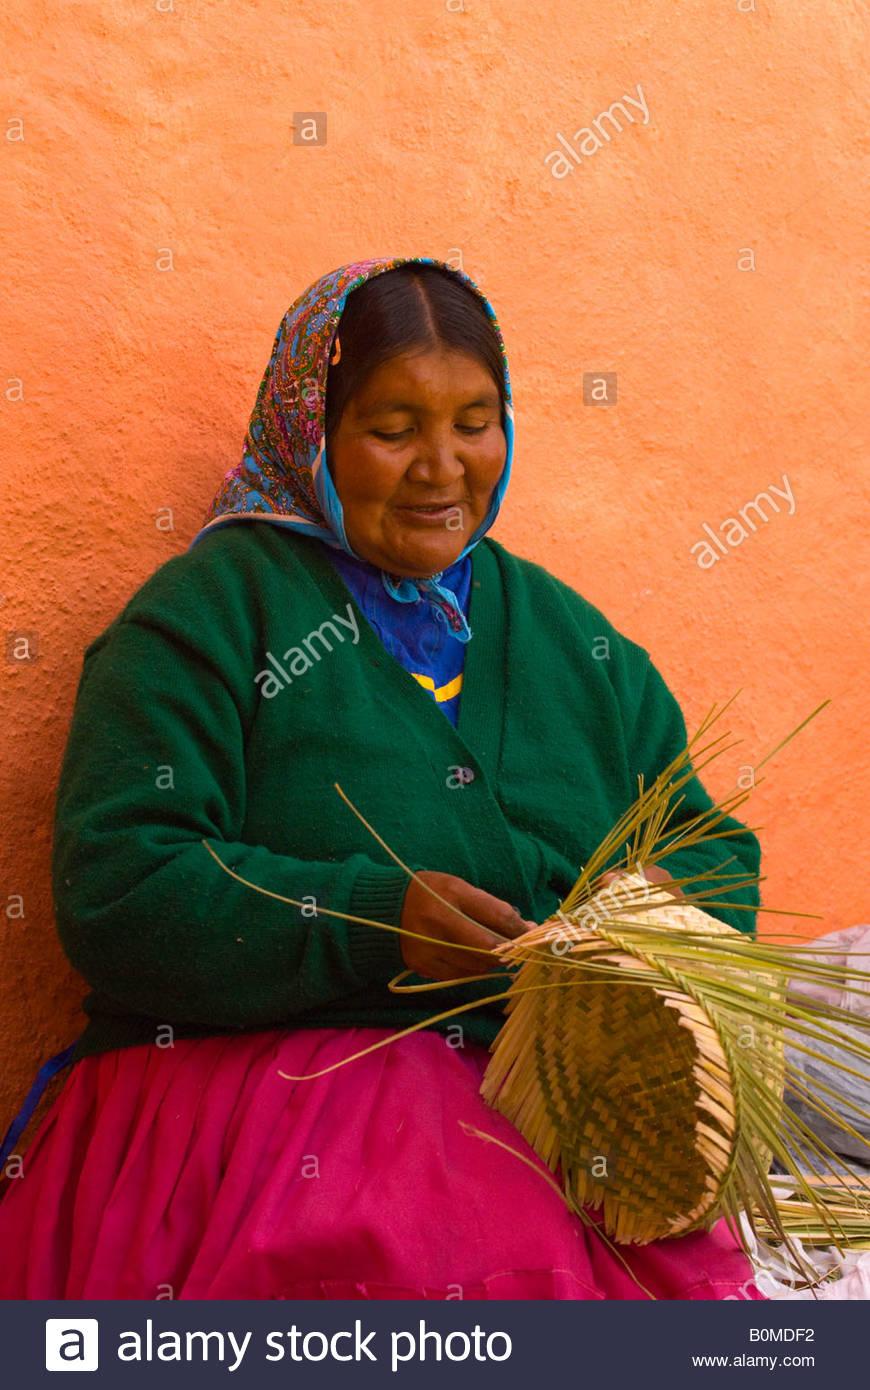 Tarahumara Indian woman weaving baskets outside the Posada Barrancas Mirador Hotel Copper Canyon near Divisadero - Stock Image